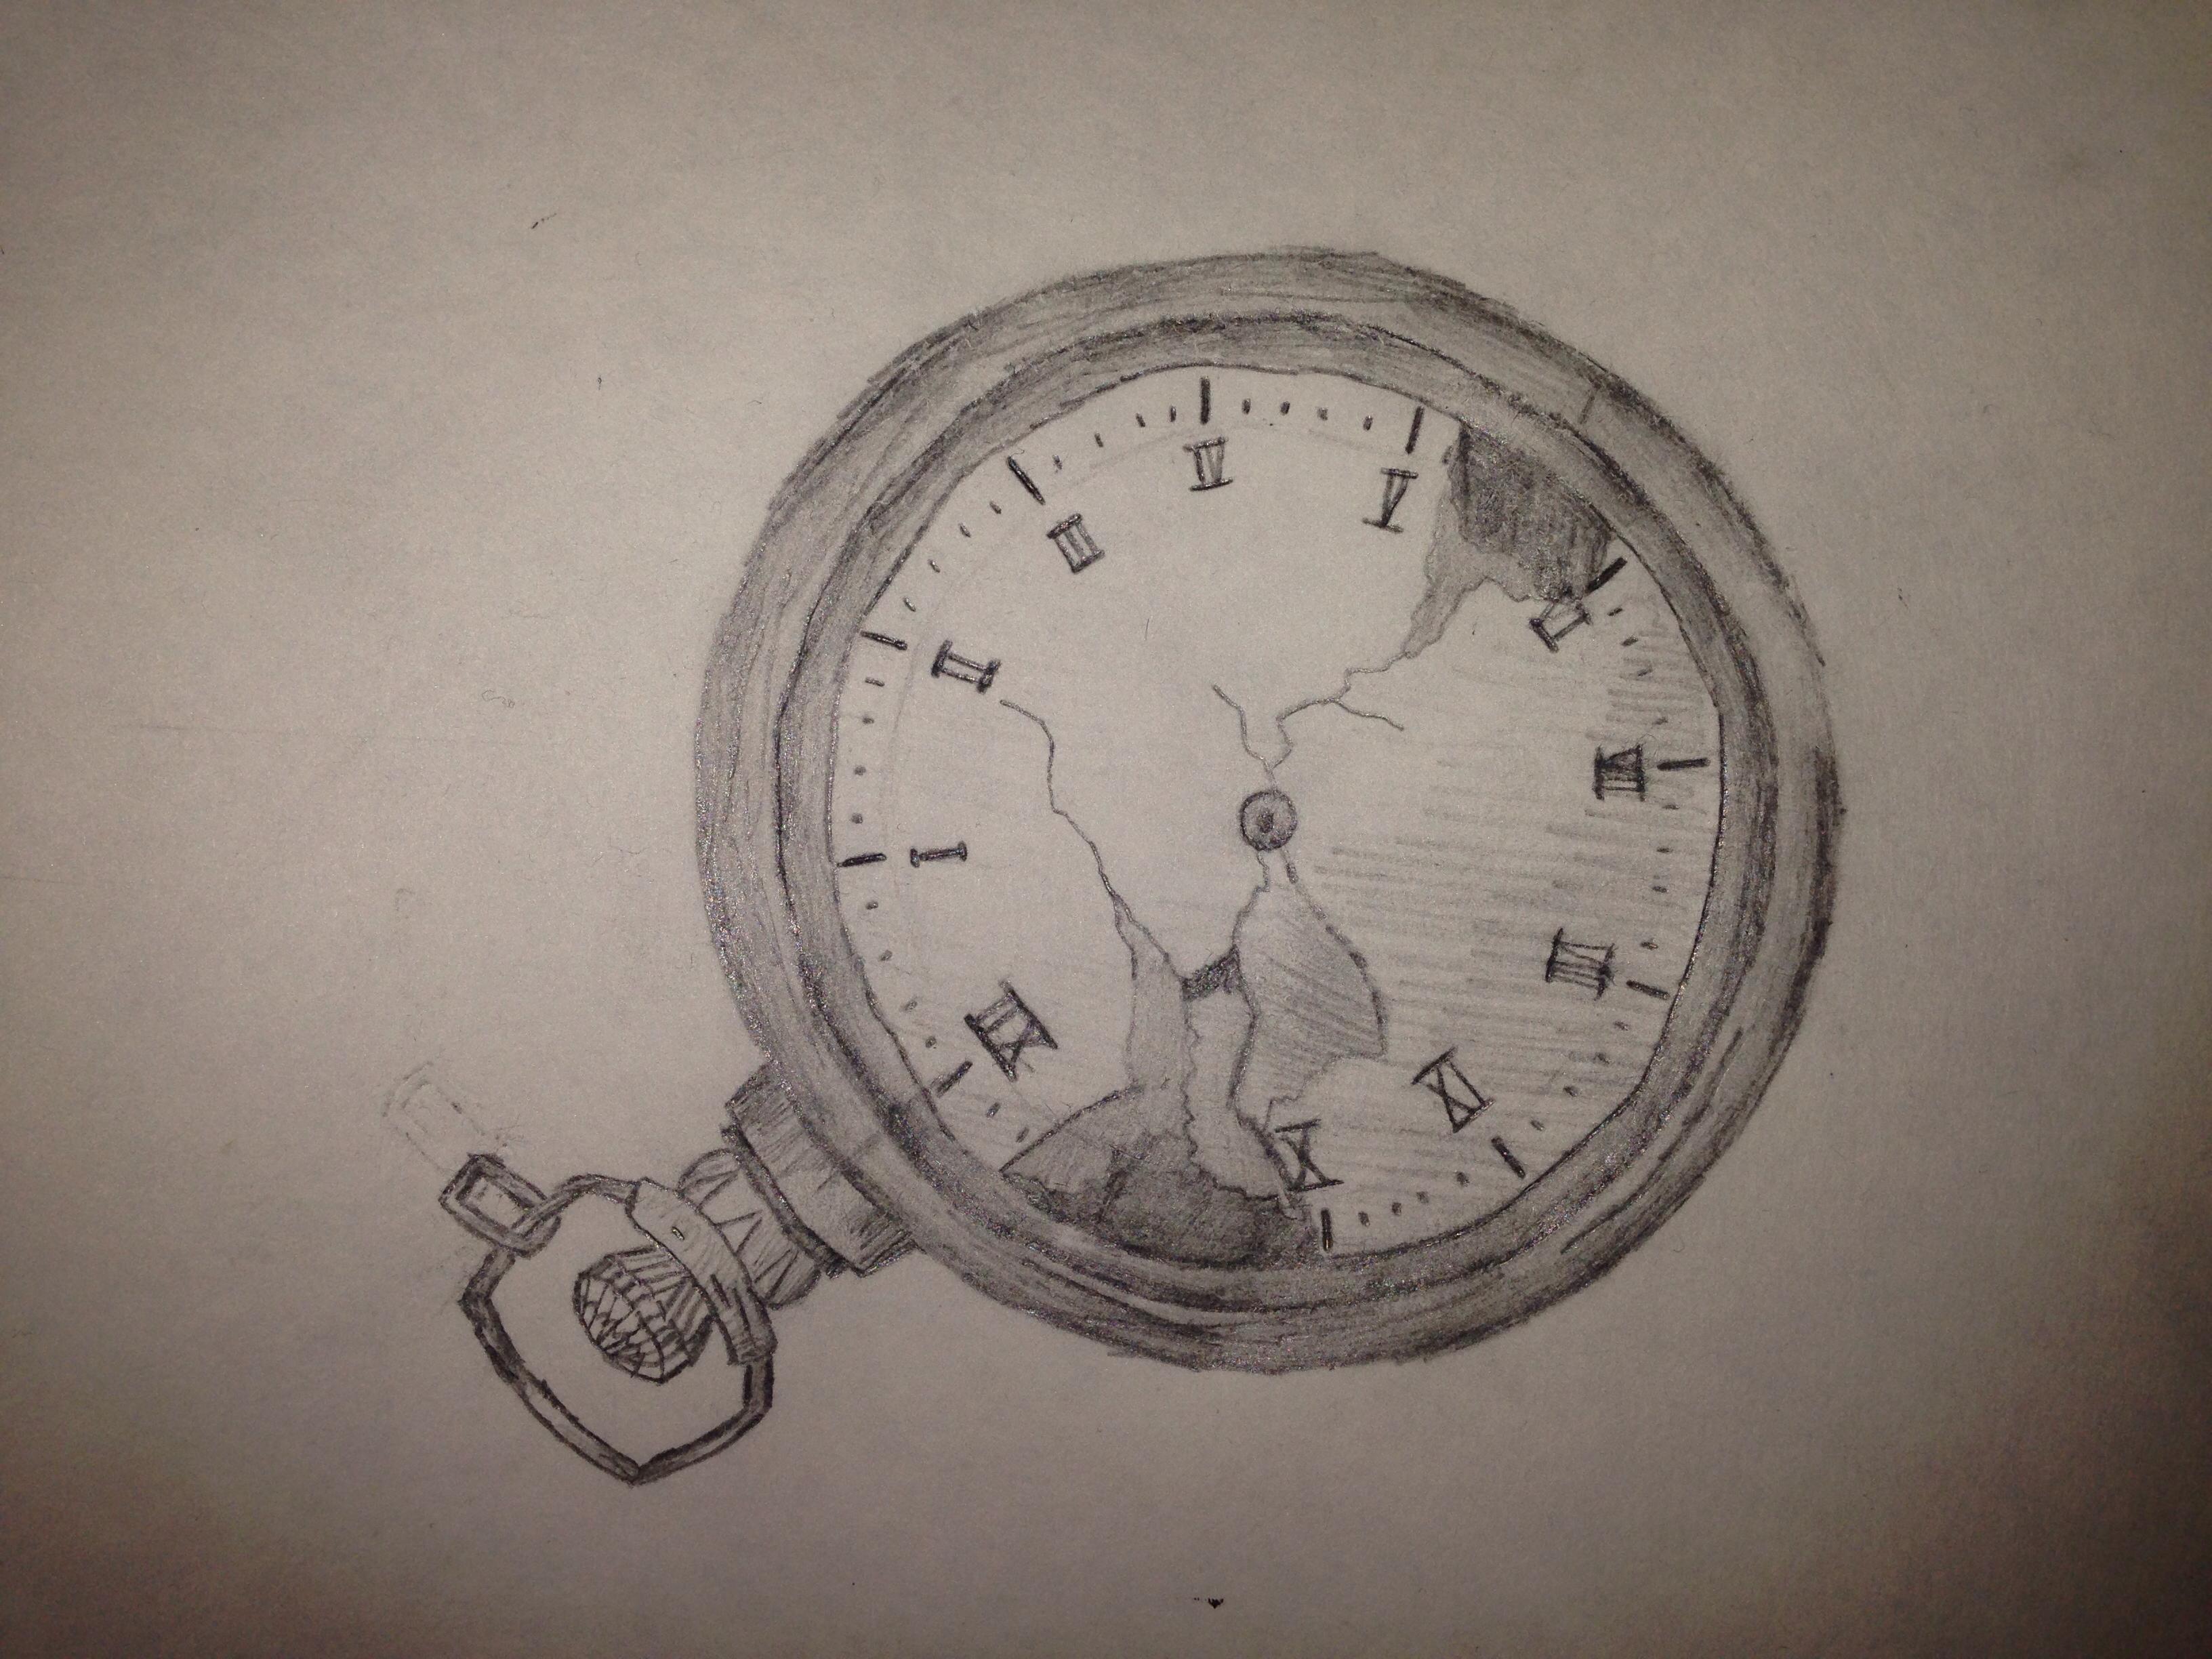 3264x2448 Pencil Drawing Stopwatch Tattoo Drawings